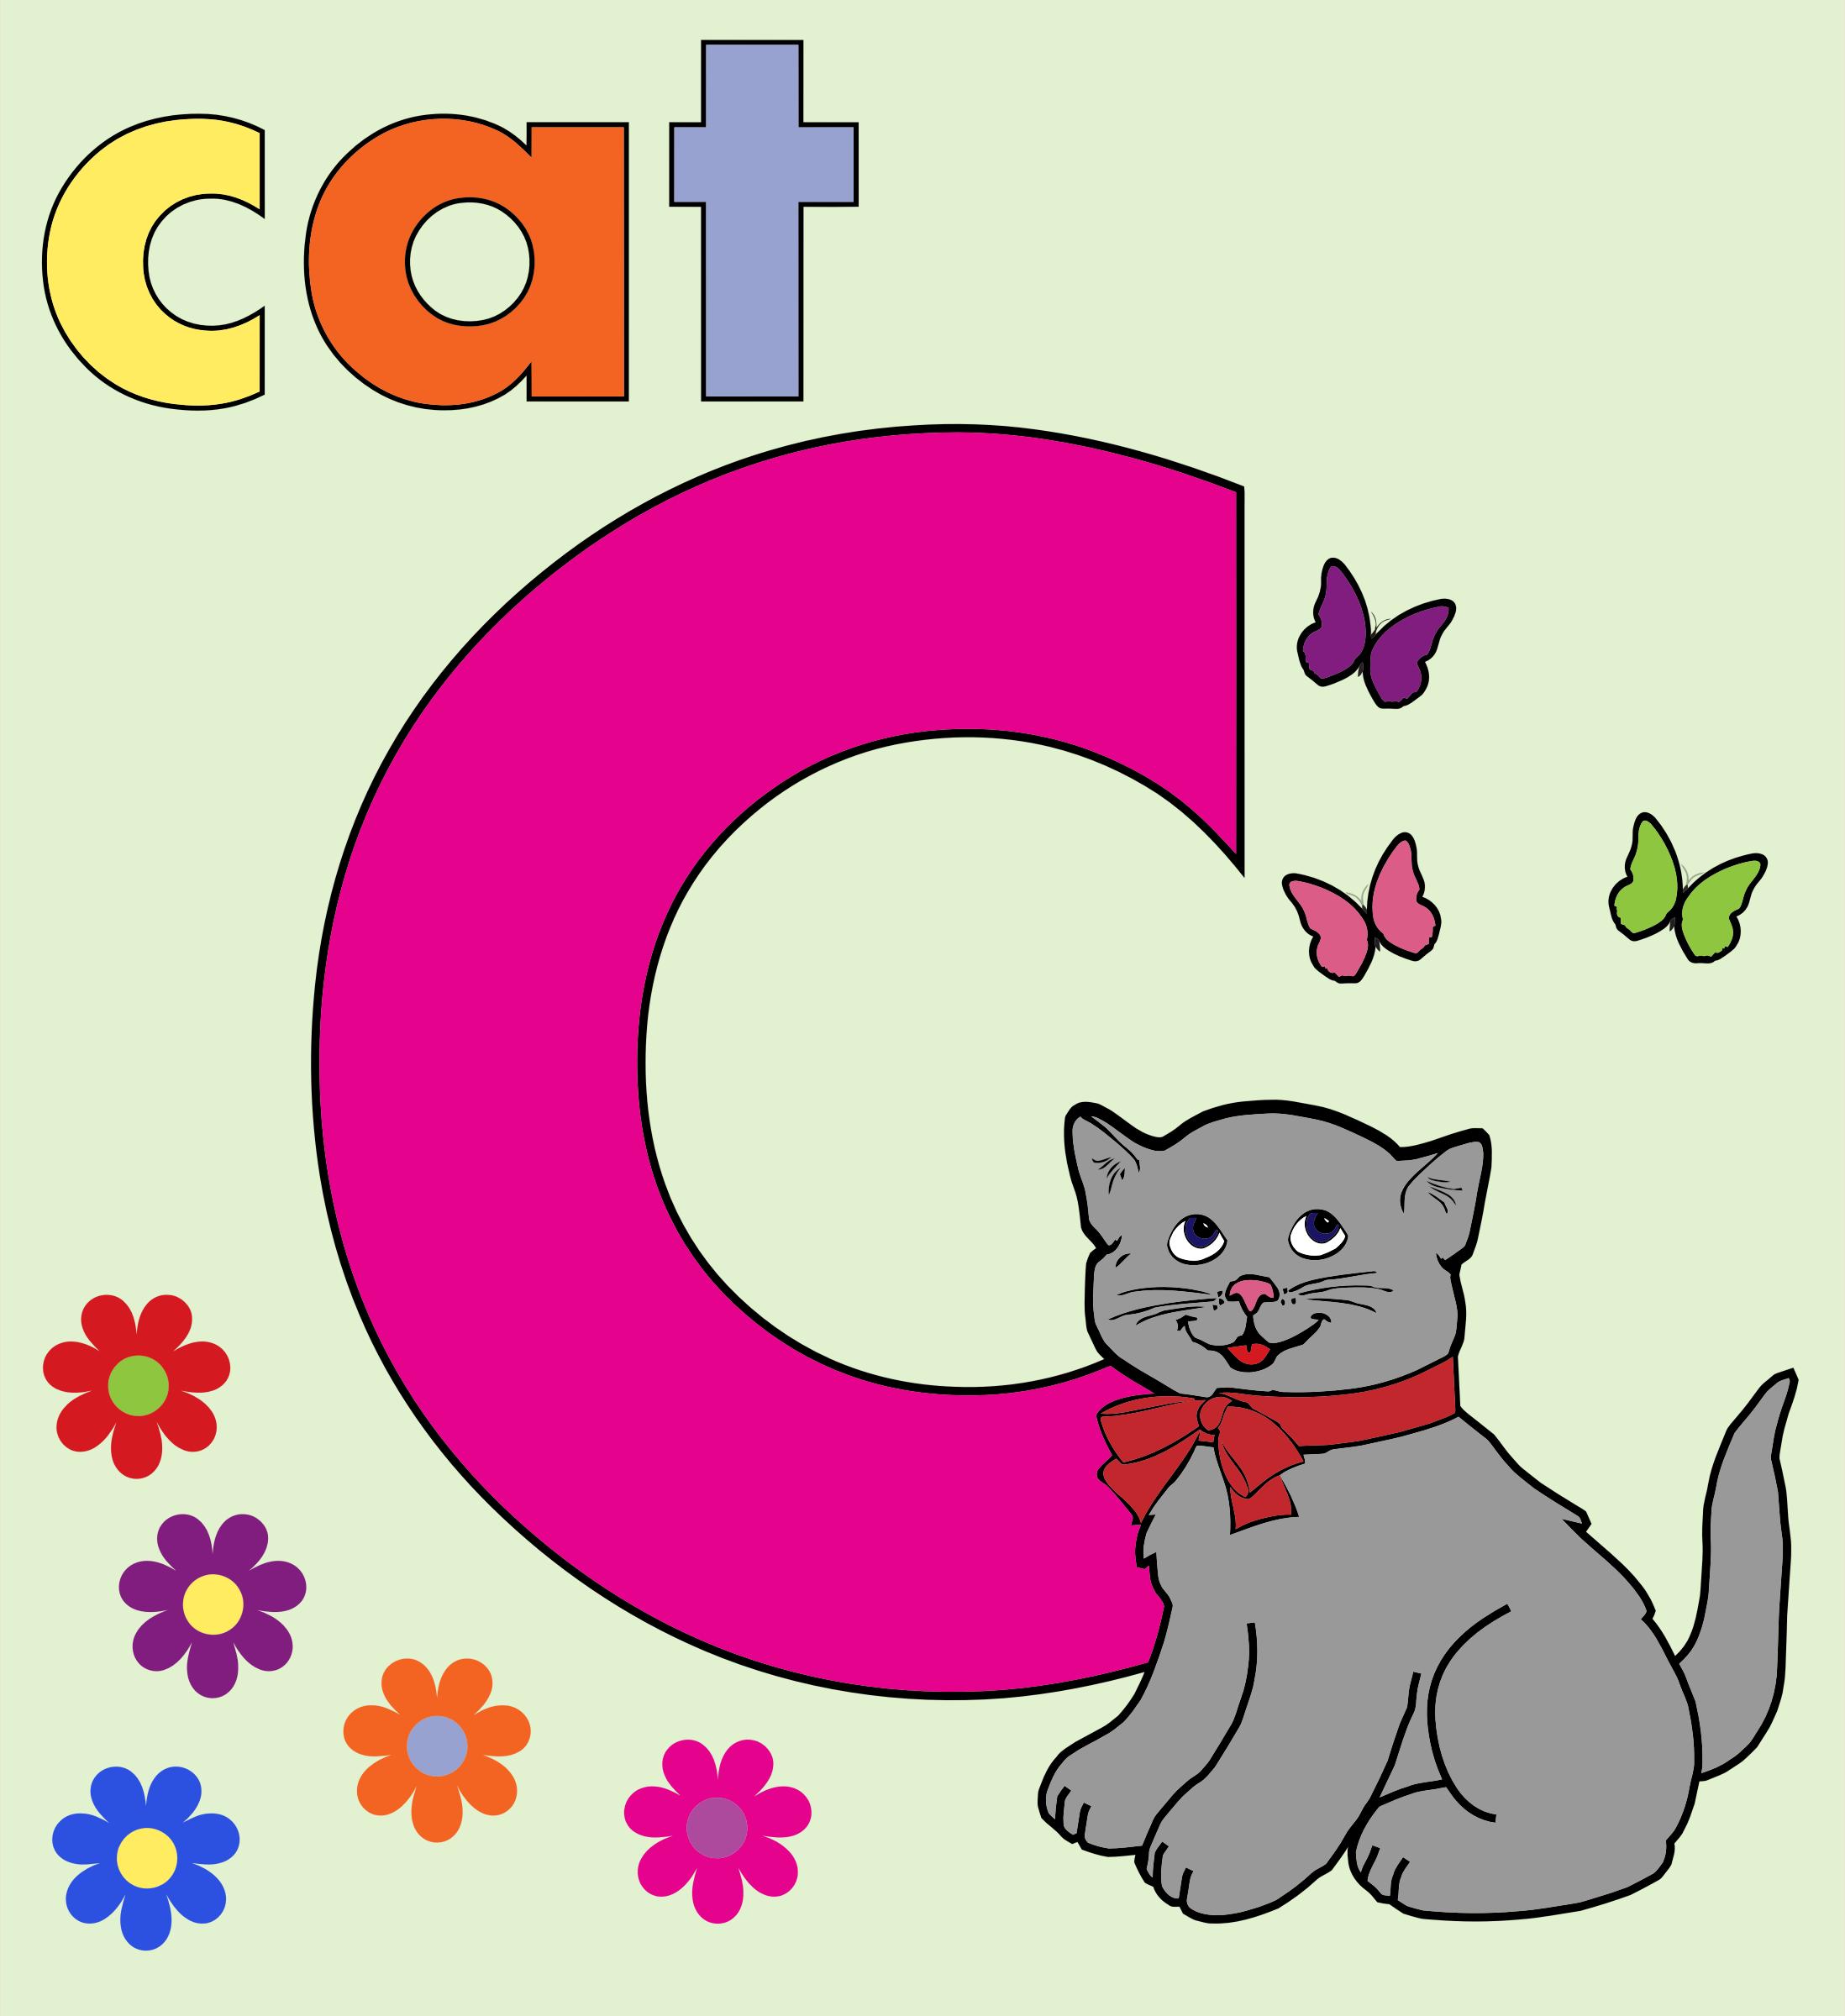 Word clipart cat Cliparts Cat icing Cliparts clipart